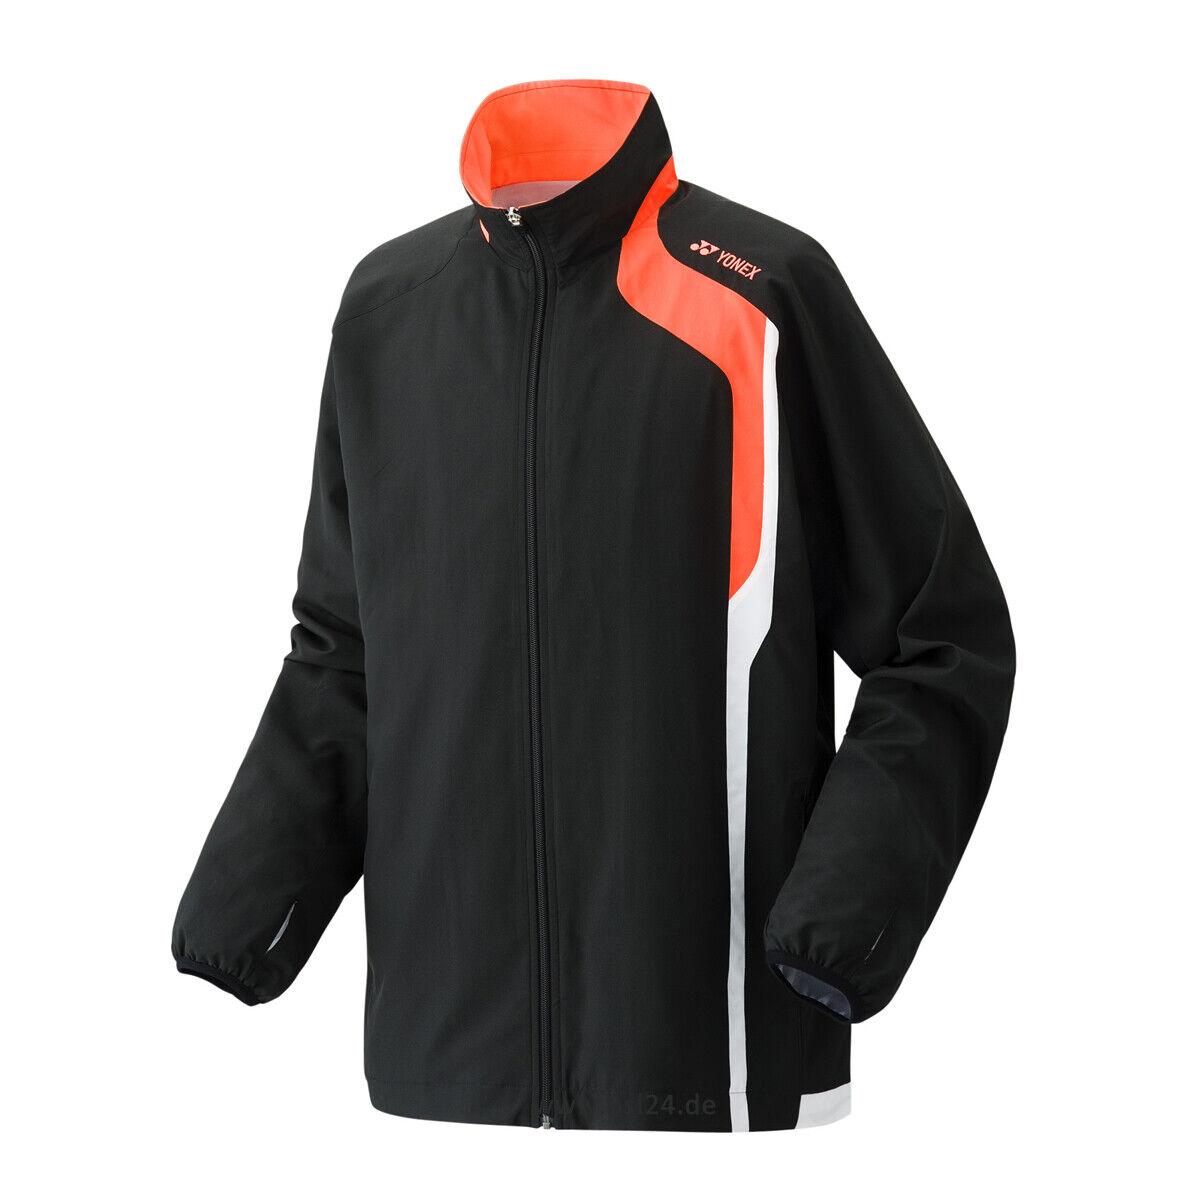 YONEX Trainingsanzug Jacke 52003 Herren OUTLET PREIS Gr. S -NEU-